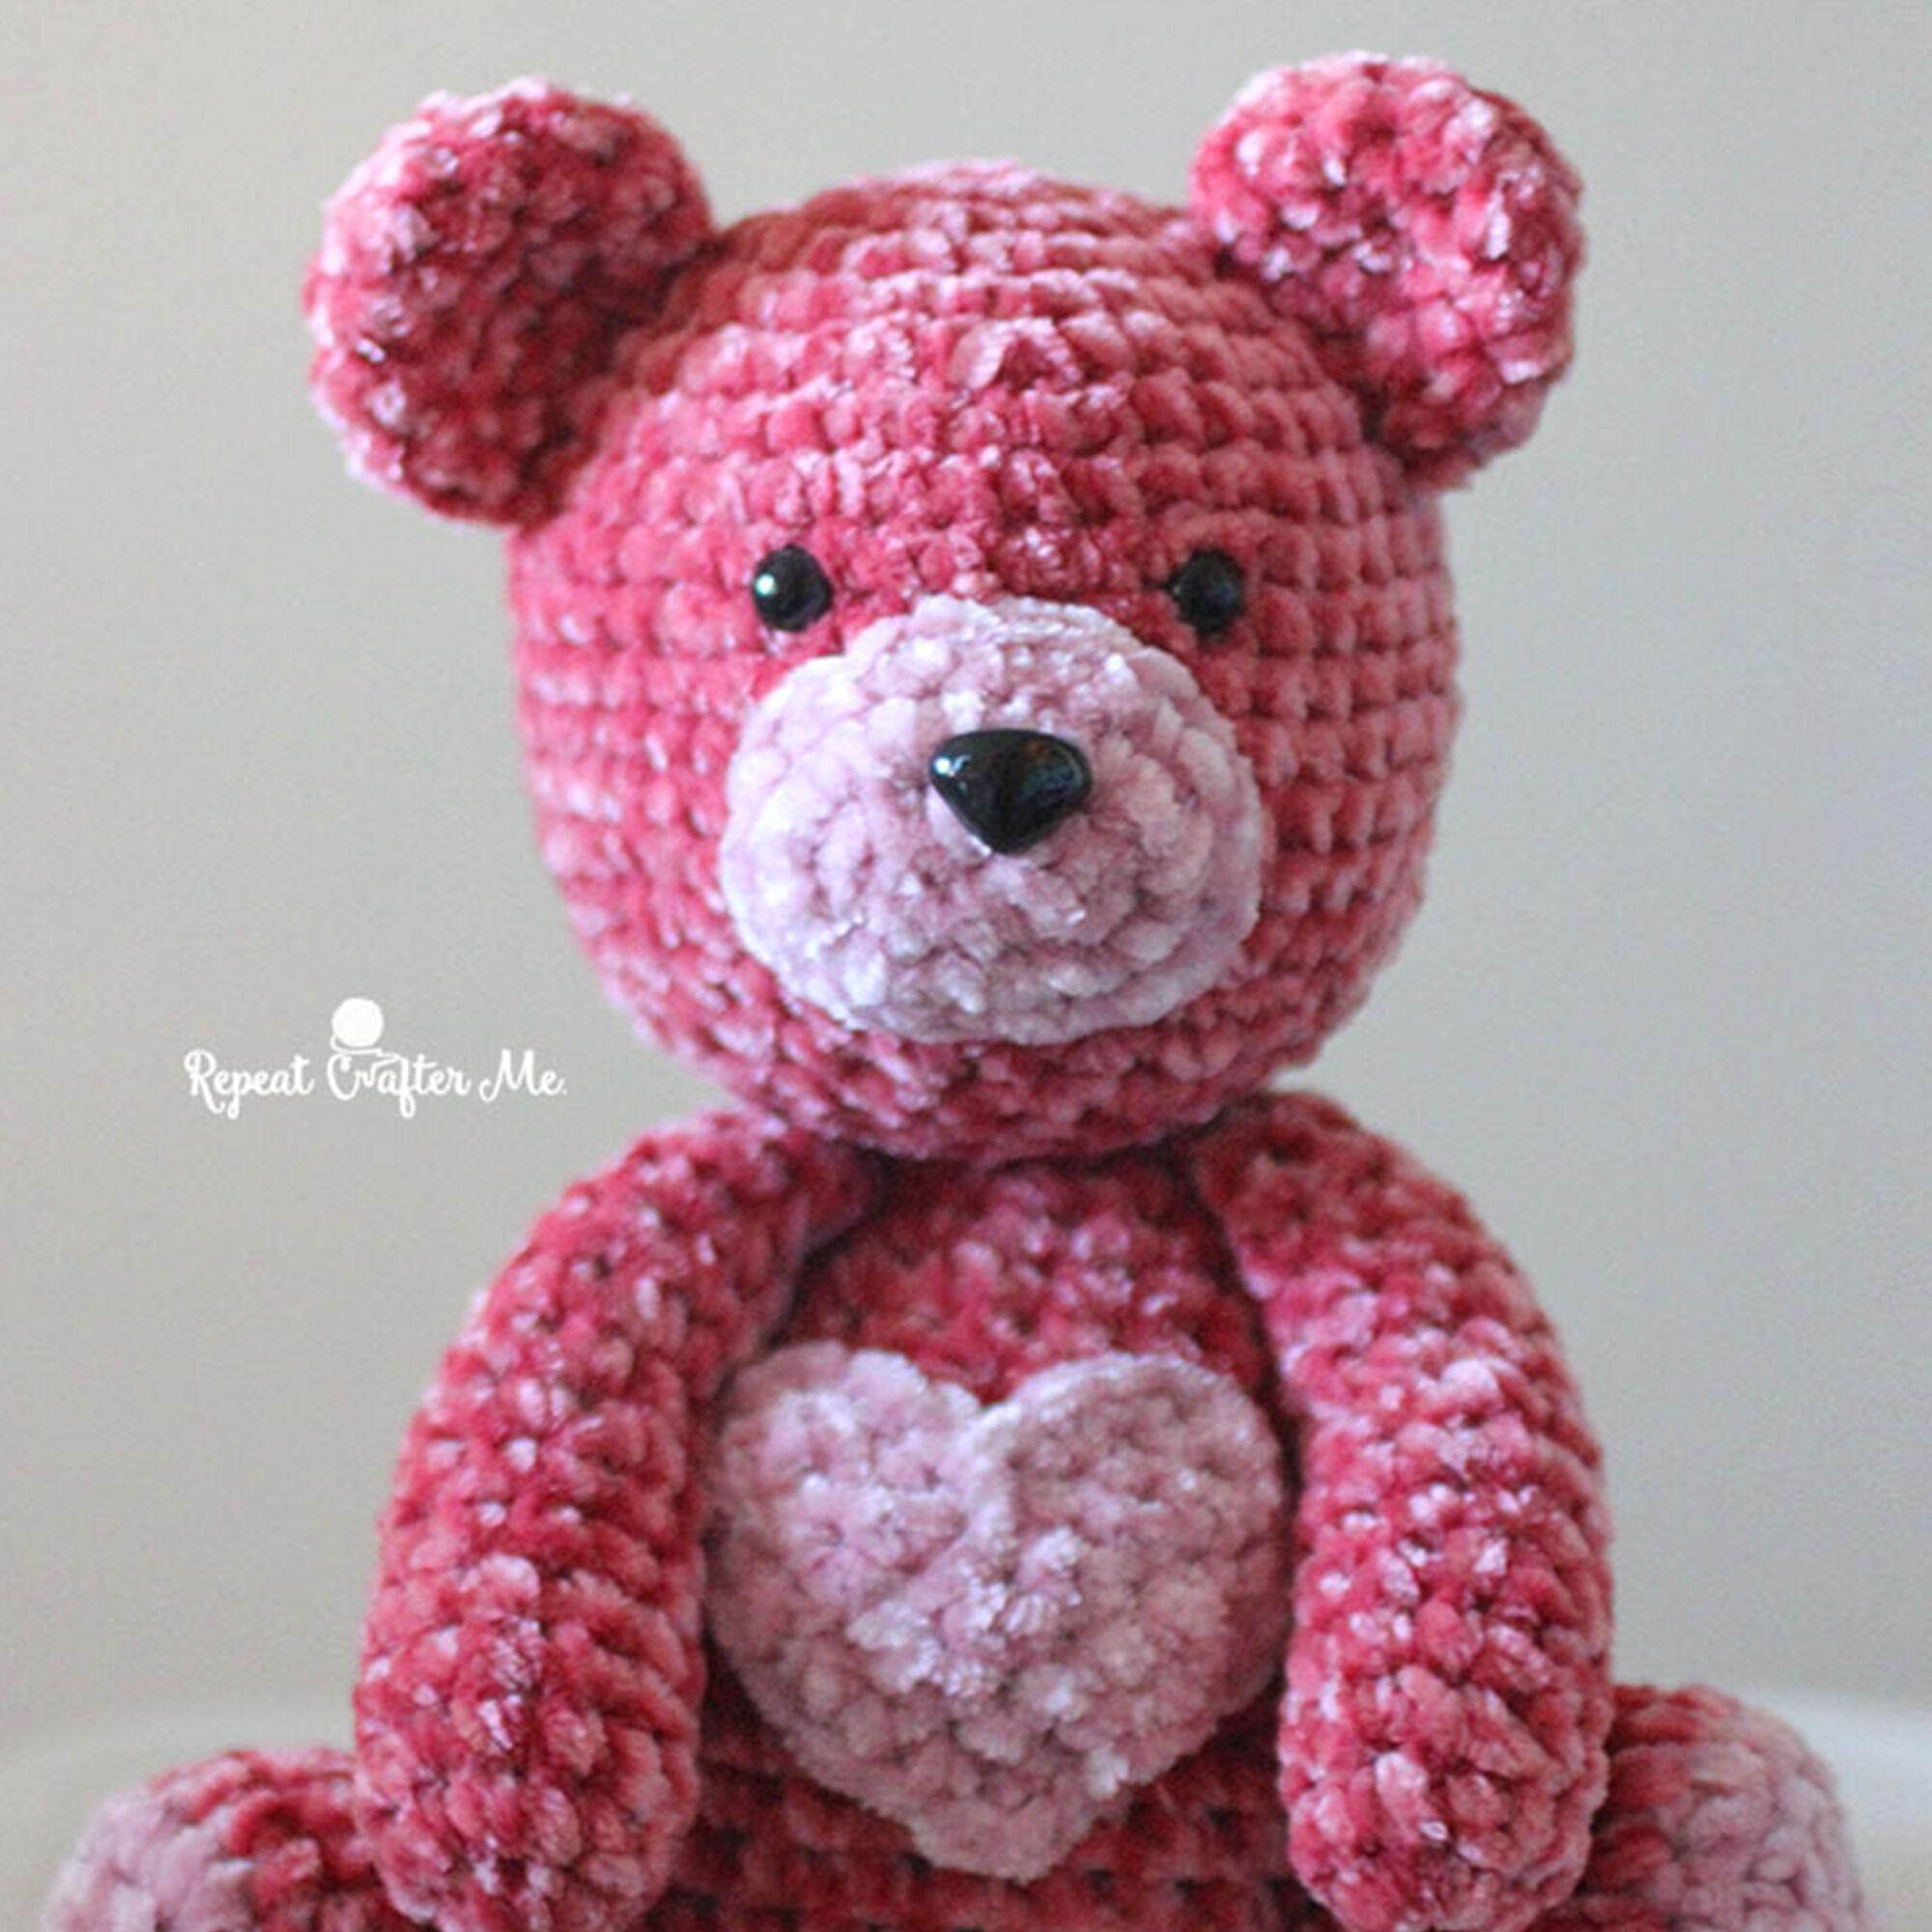 Amigurumi Valentine Teddy Bear Part One - YouTube | 2000x2000